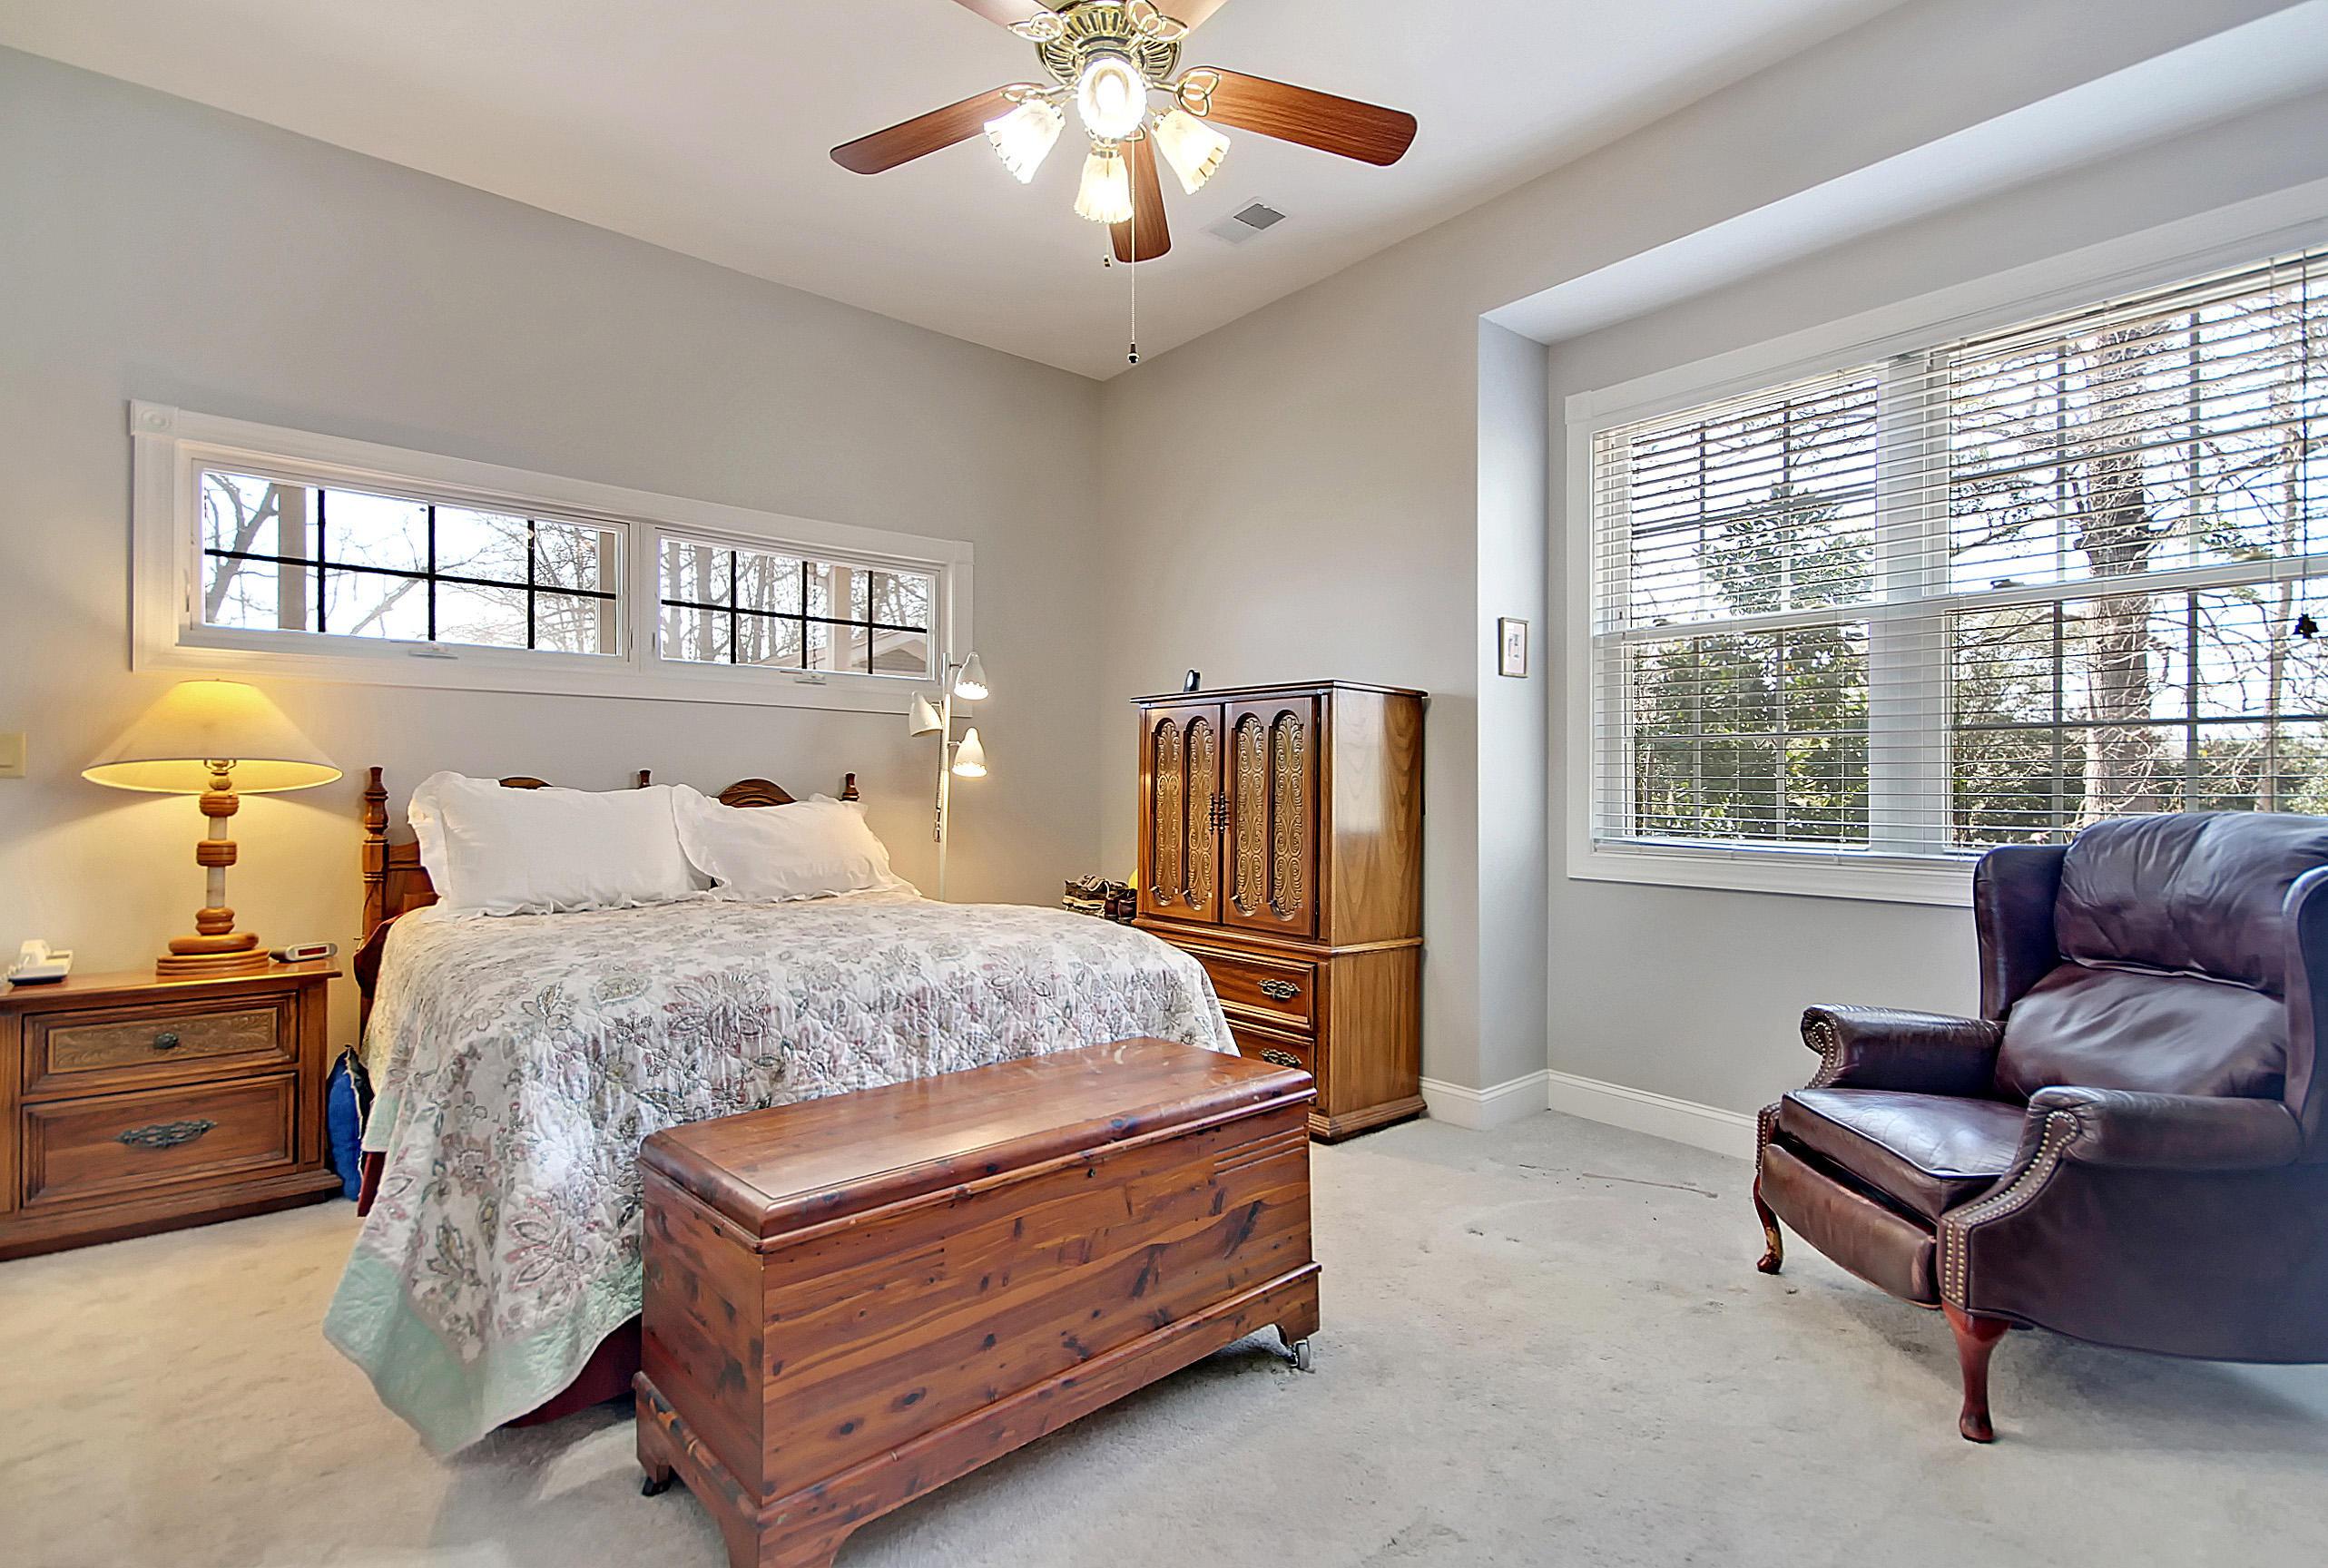 Cross Subd (Longpoint) Homes For Sale - 1191 Longpoint, Cross, SC - 43